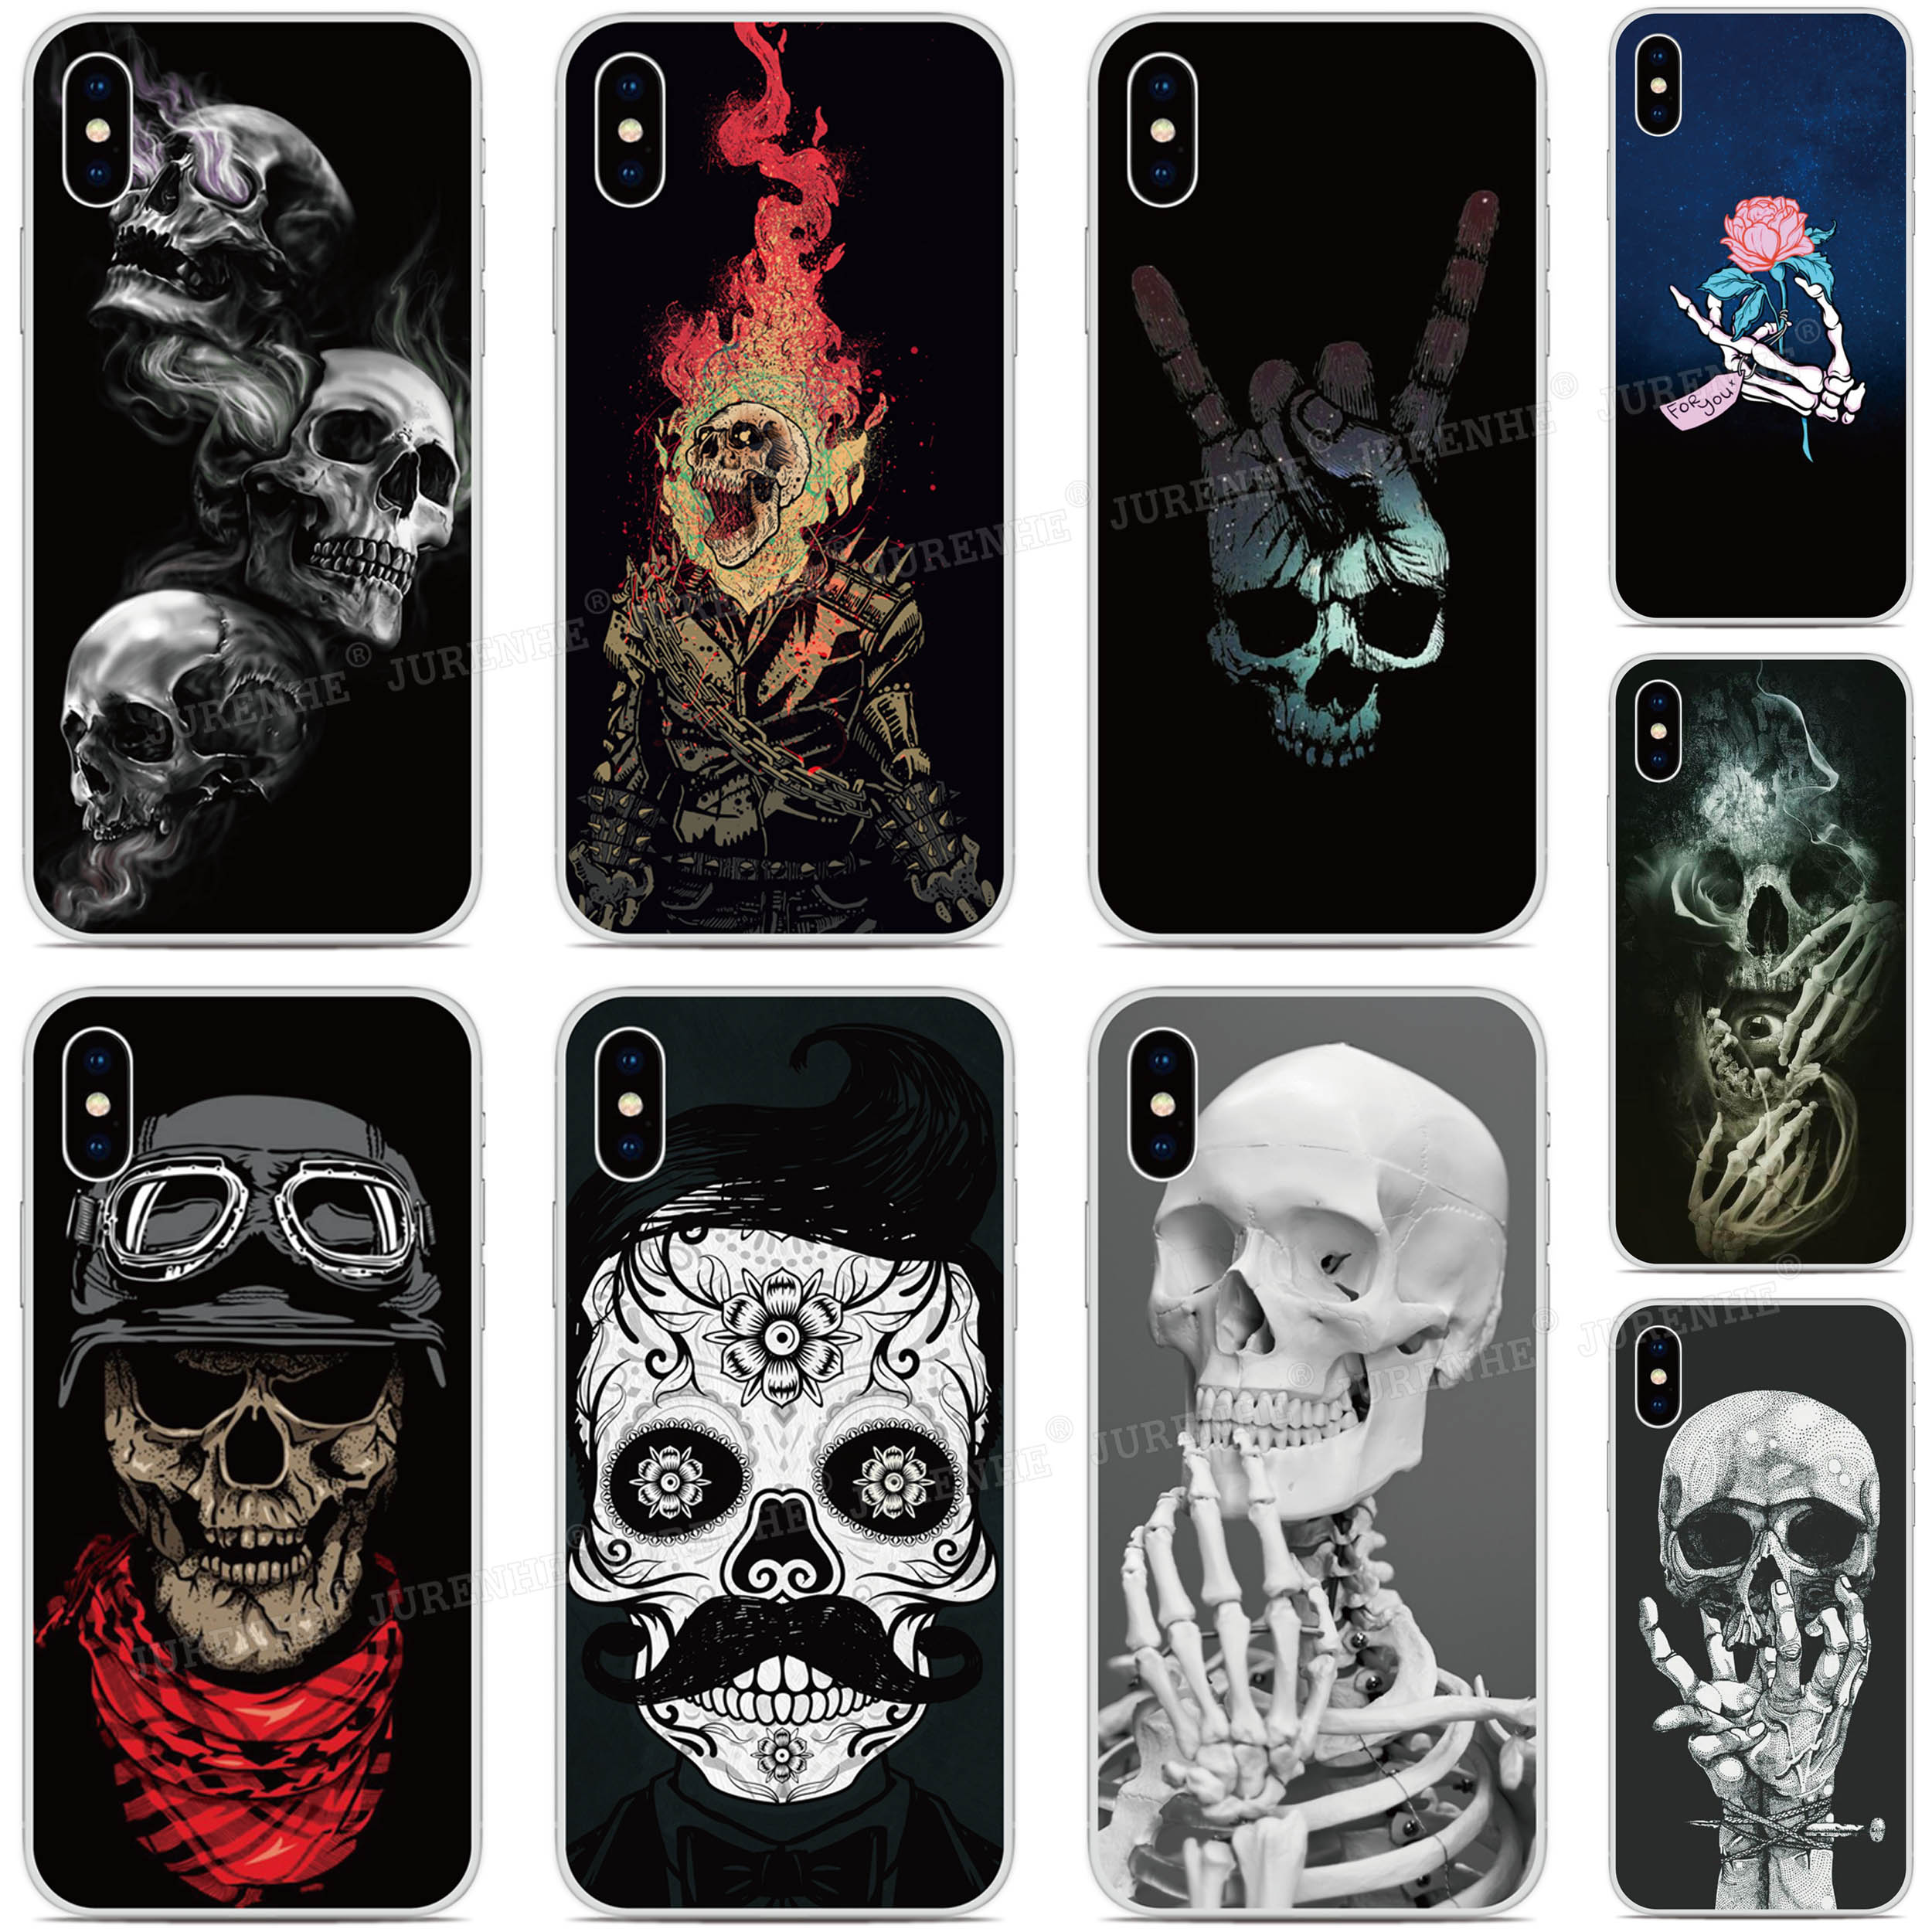 Esqueleto crânio caso de telefone para blackberry keyone chave 2 priv movimento passaporte q30 z10 q10 dtek50 dtek60 dtek70 tpu capa macia